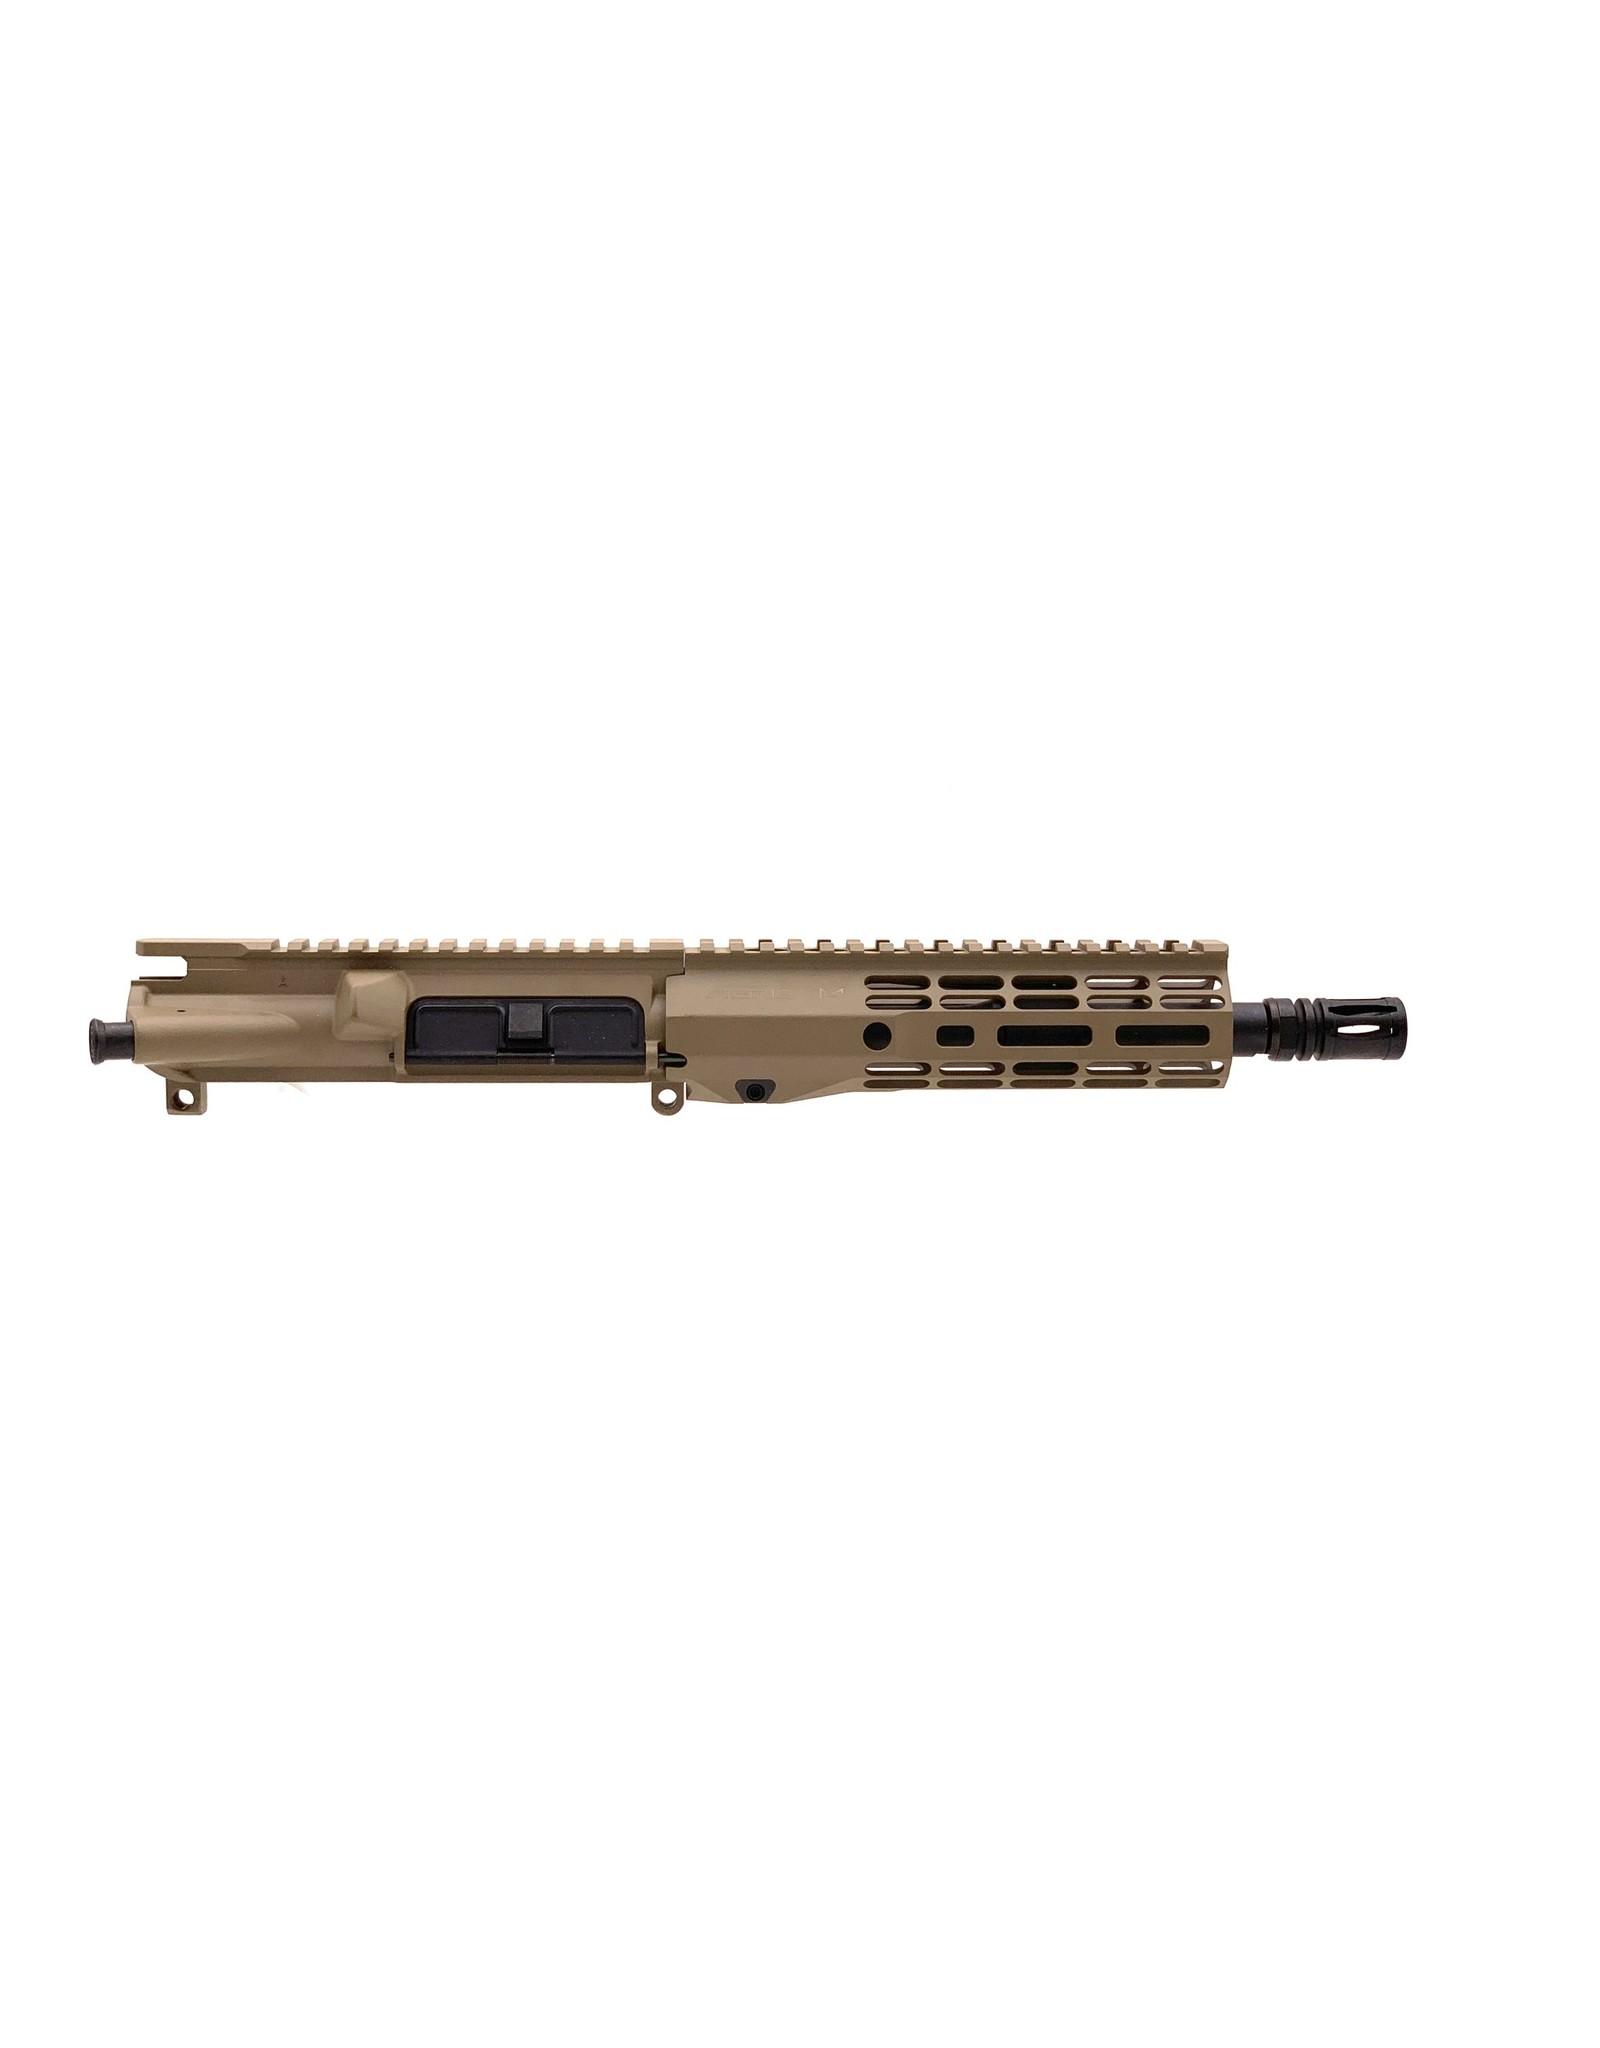 "Sam Diego Tactical 8.5"" 300 BLK Complete Upper - FDE Cerakote"